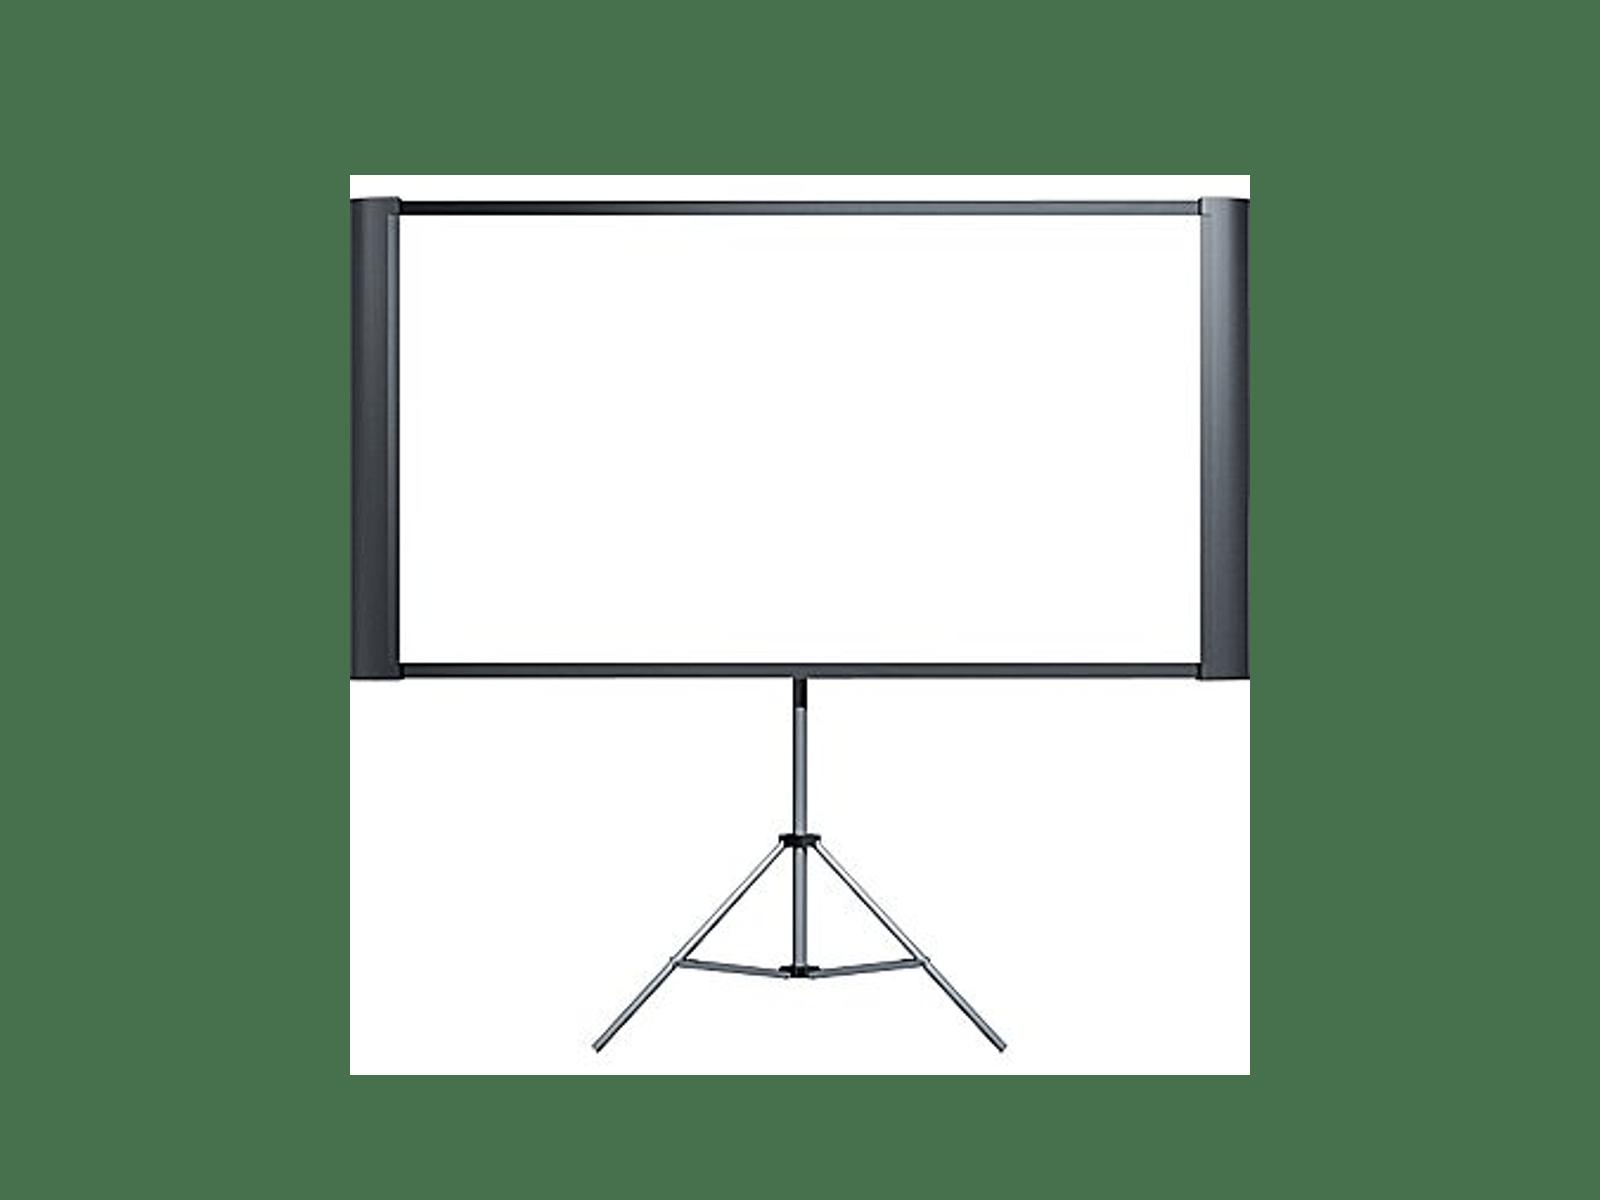 3 X 6 Projector Screen